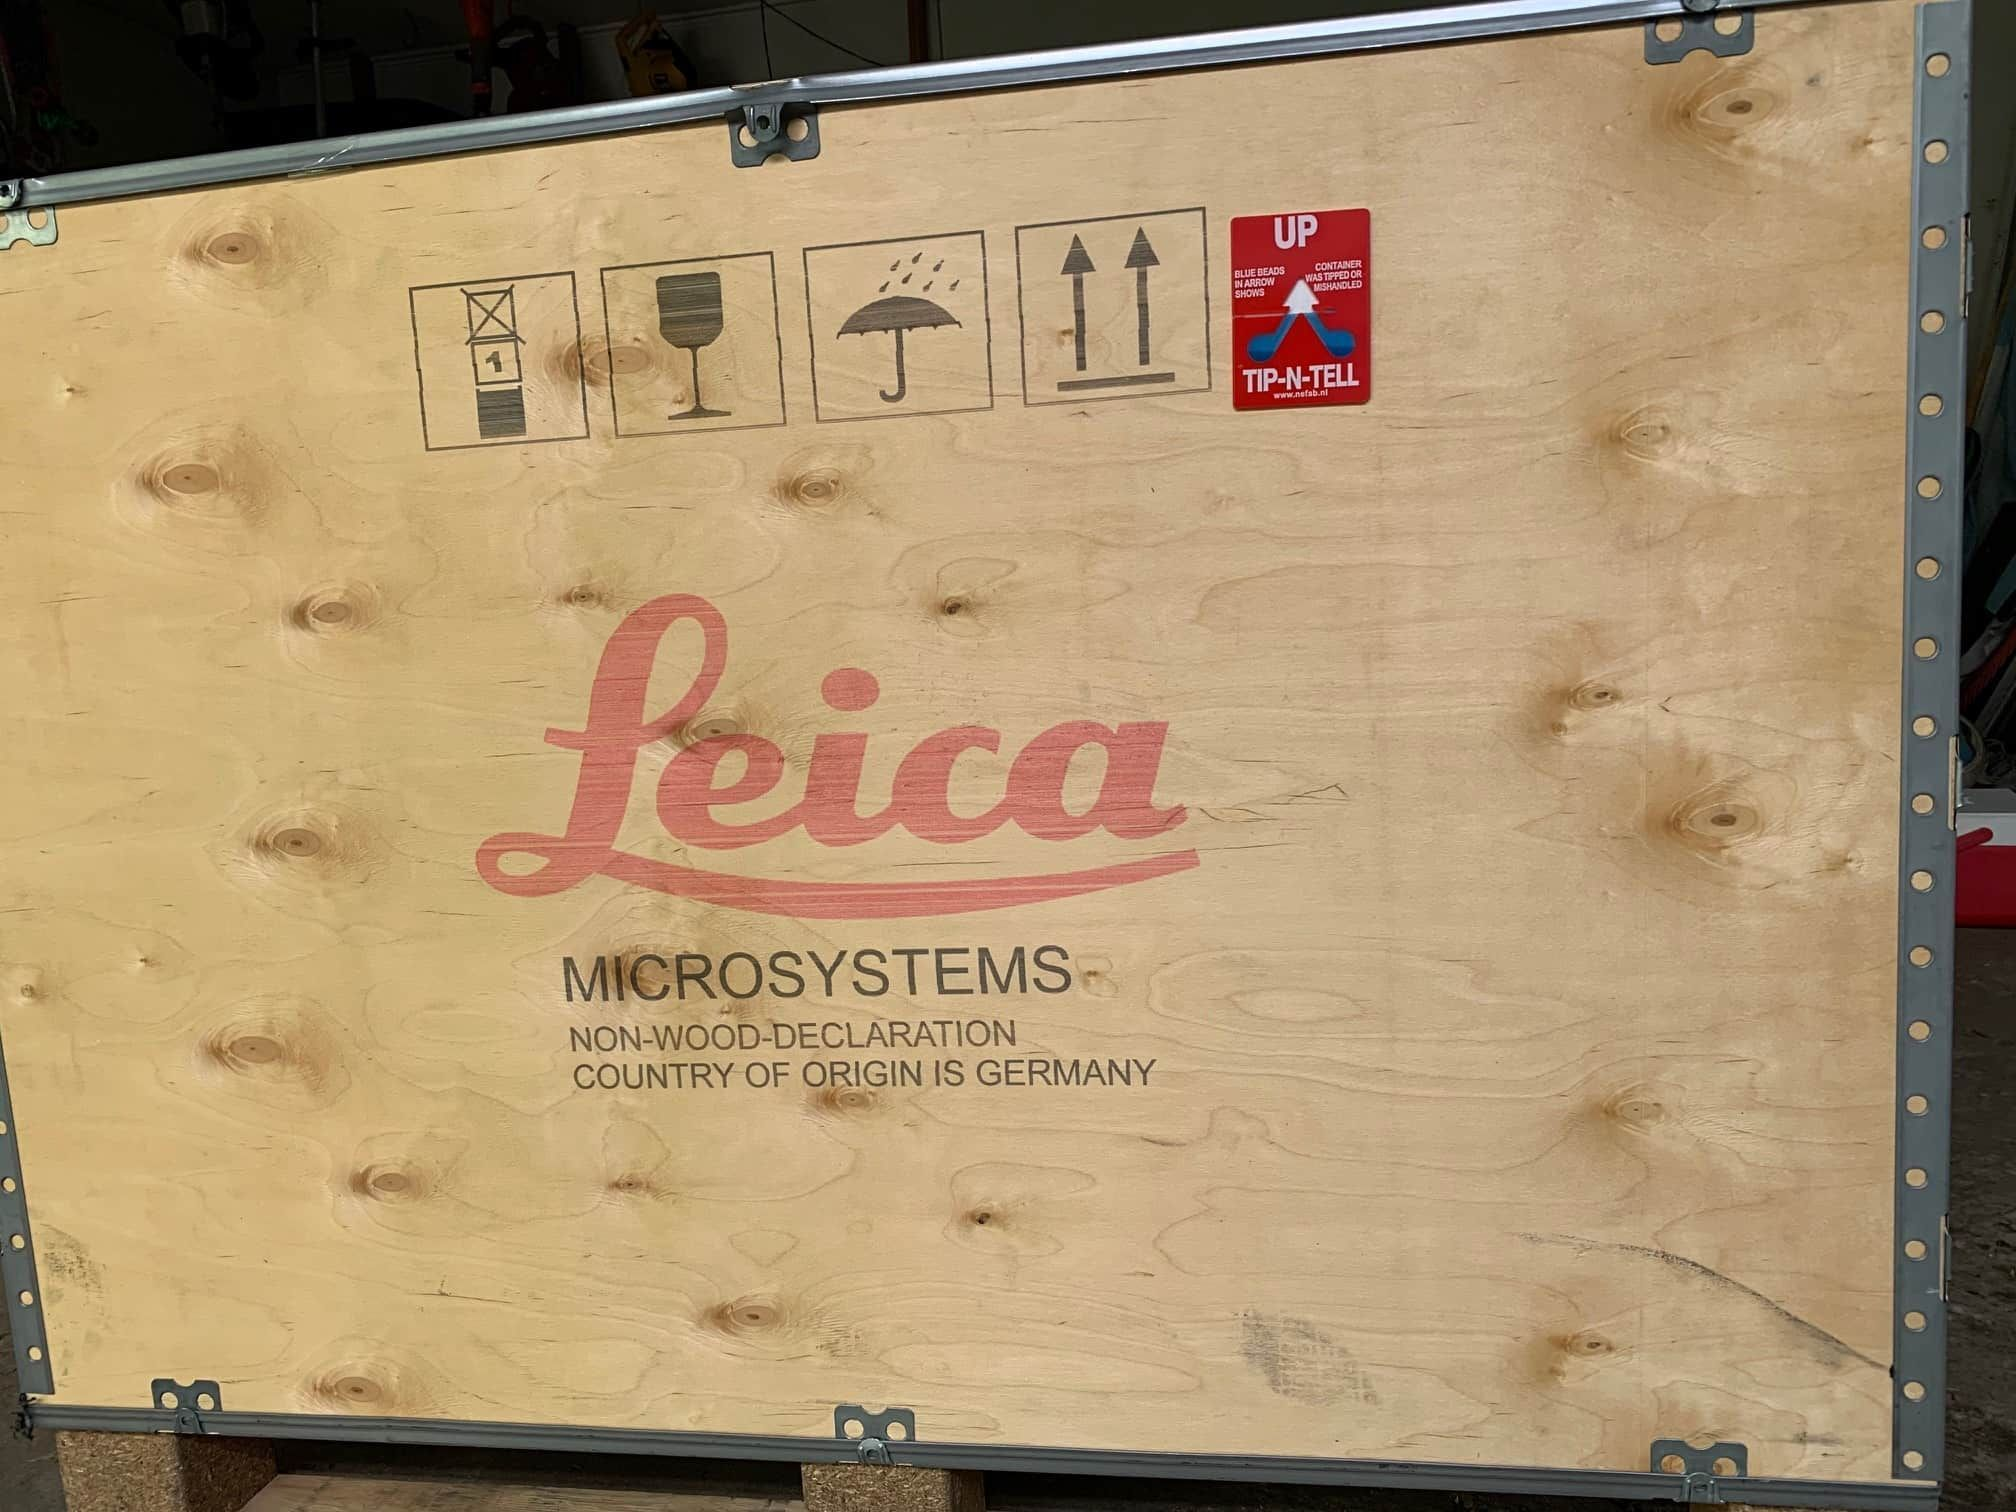 Leica TCS SP8 Confocal